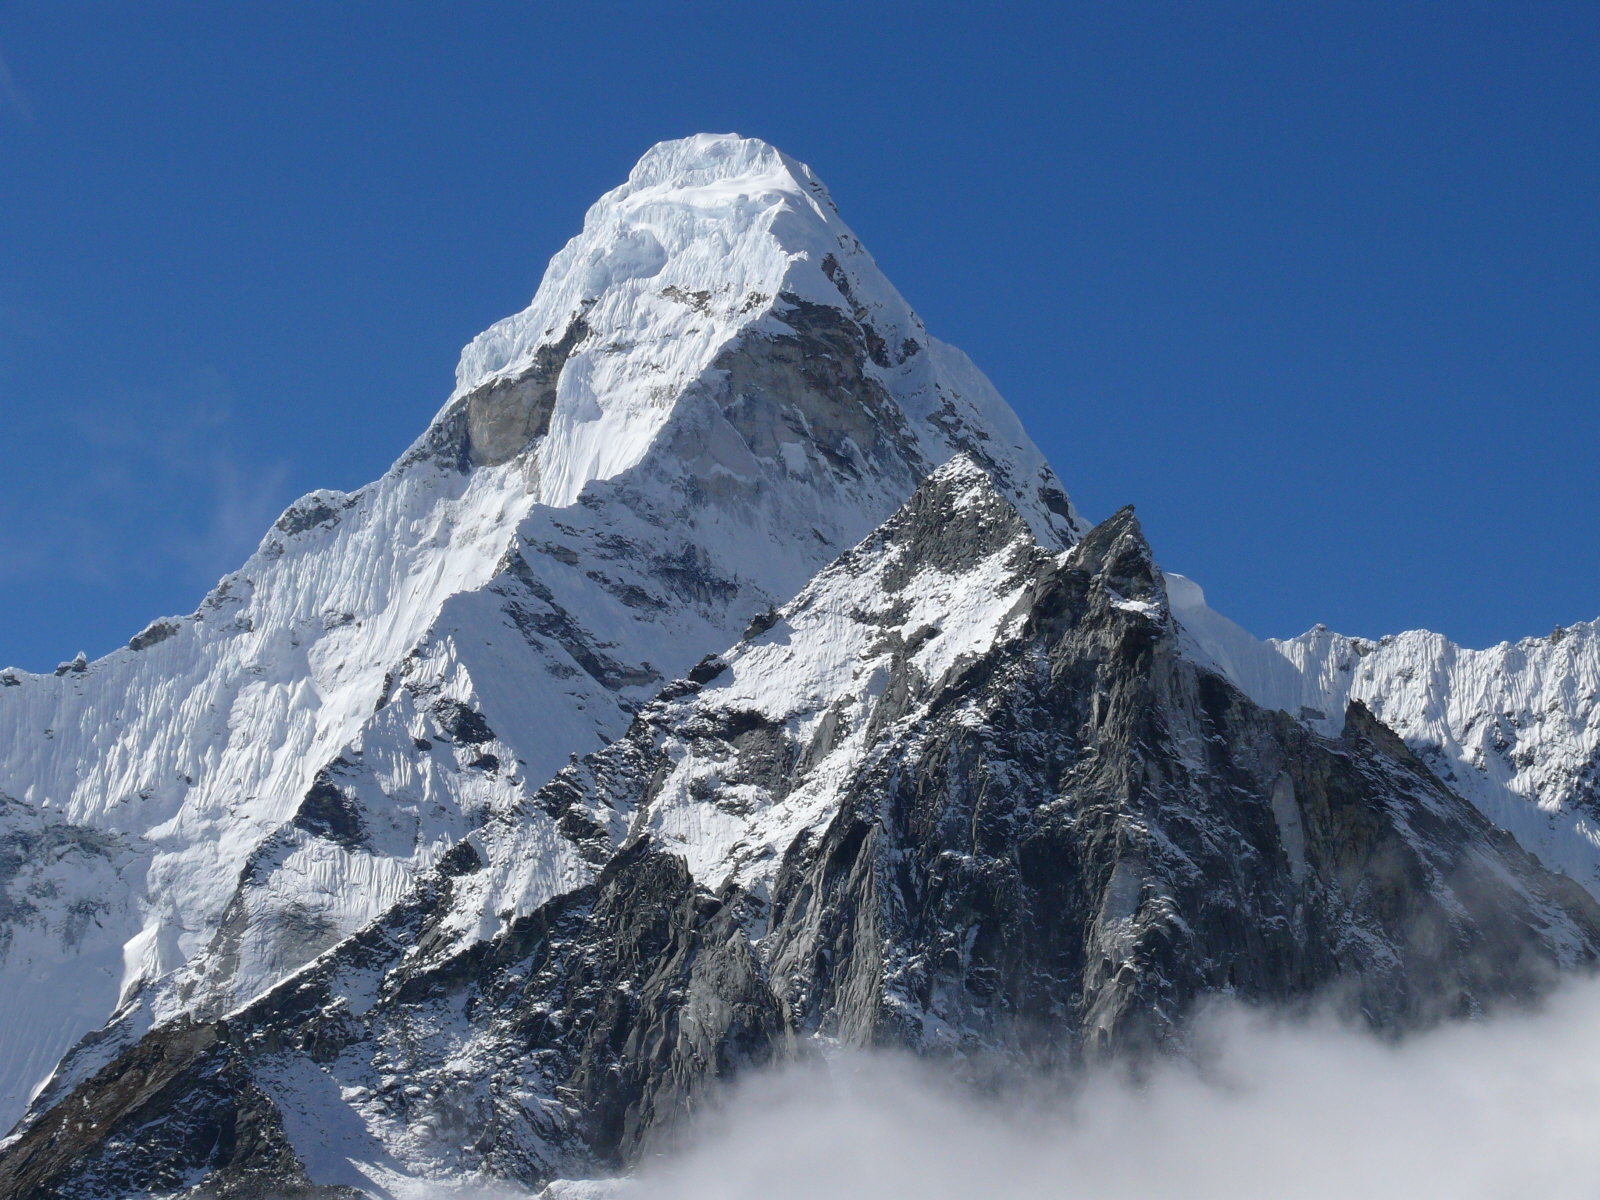 Himalayas Wallpapers Prints Posters 1600x1200